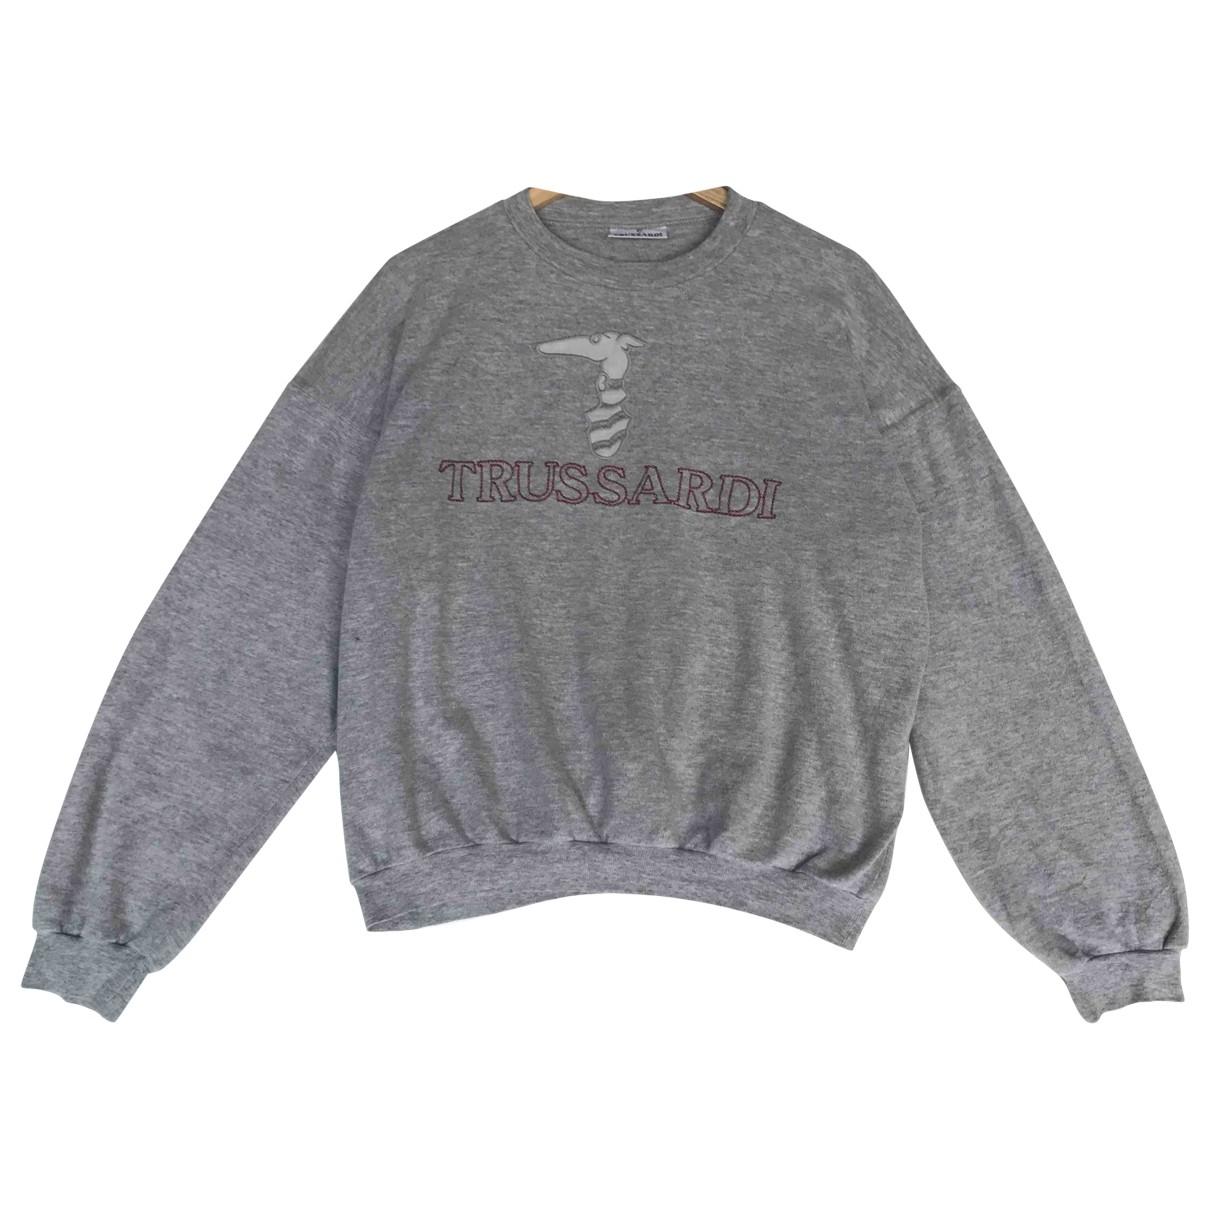 Trussardi \N Grey Cotton Knitwear & Sweatshirts for Men L International